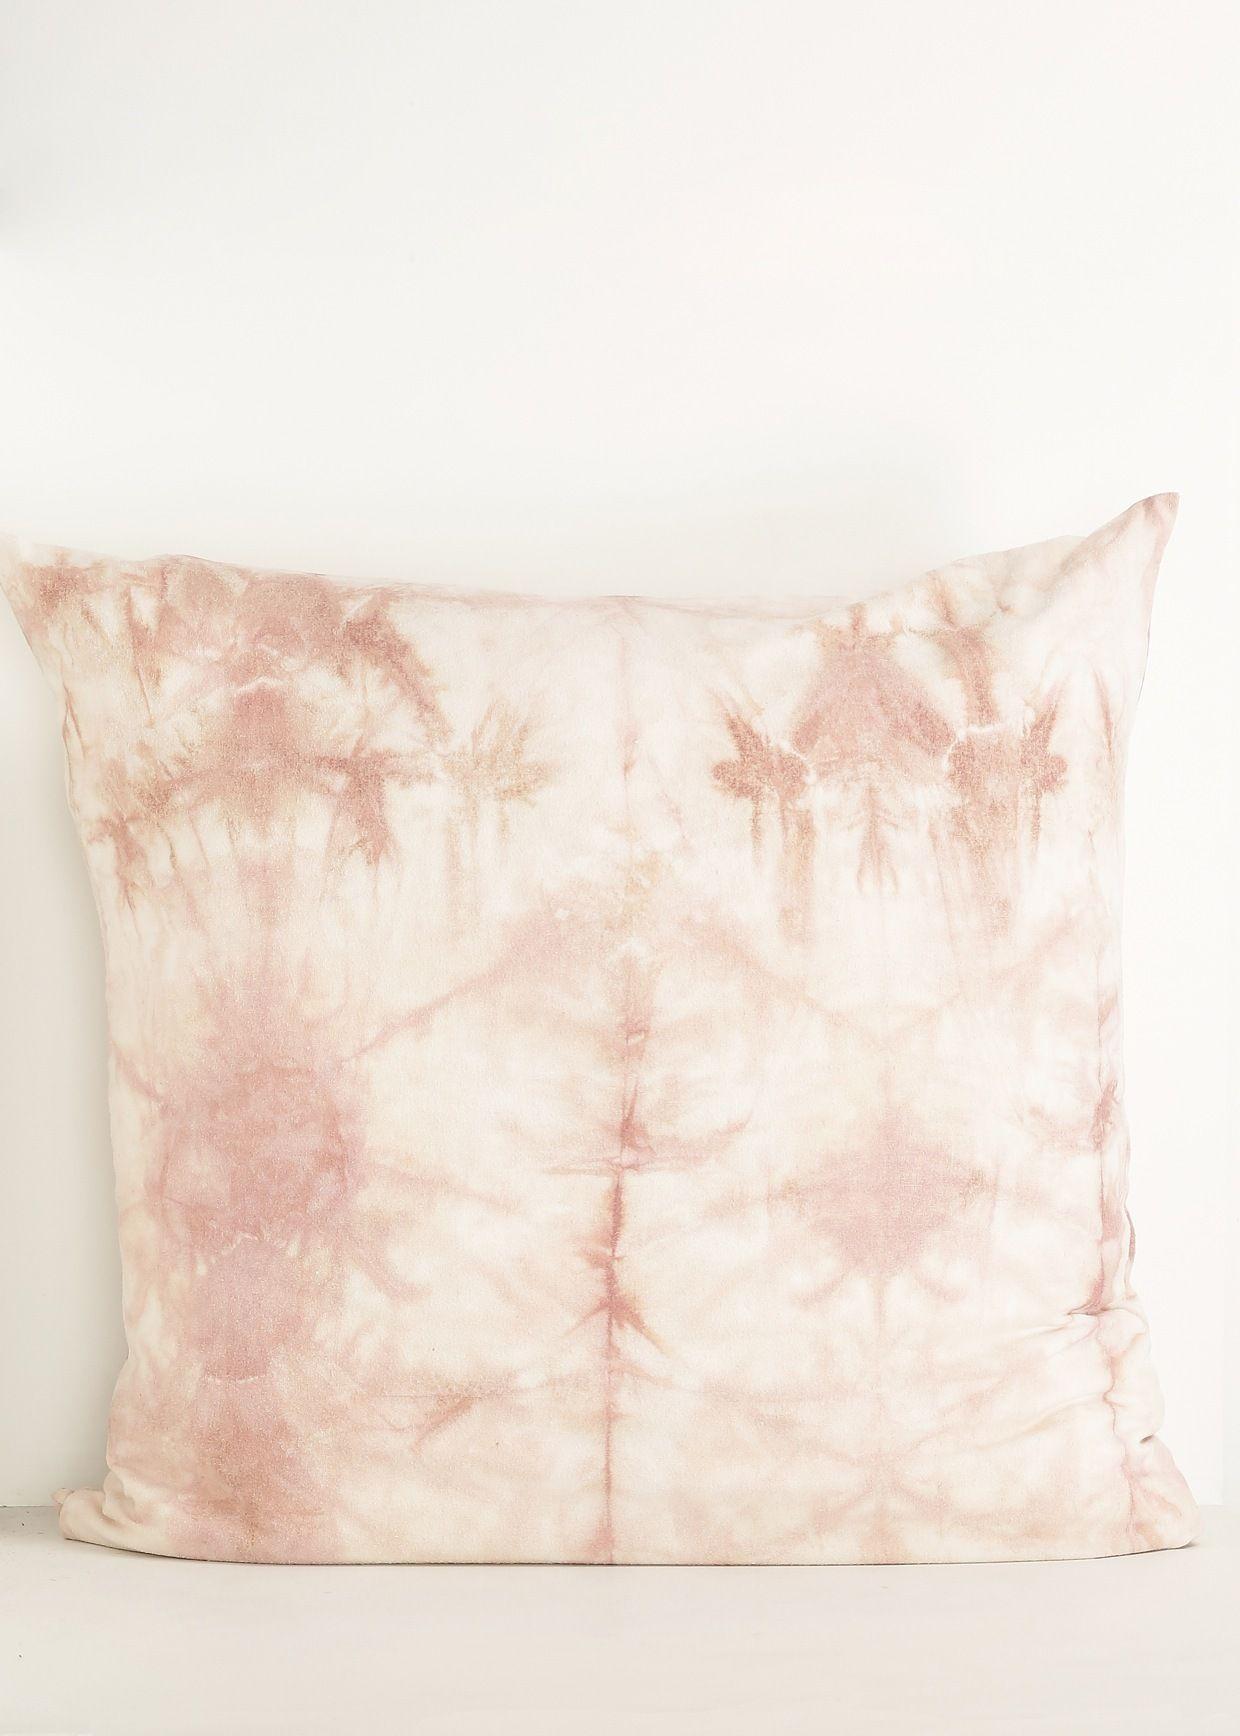 1d7320521a6 Totokaelo Art–Object - Shabd Desert Large Pillow